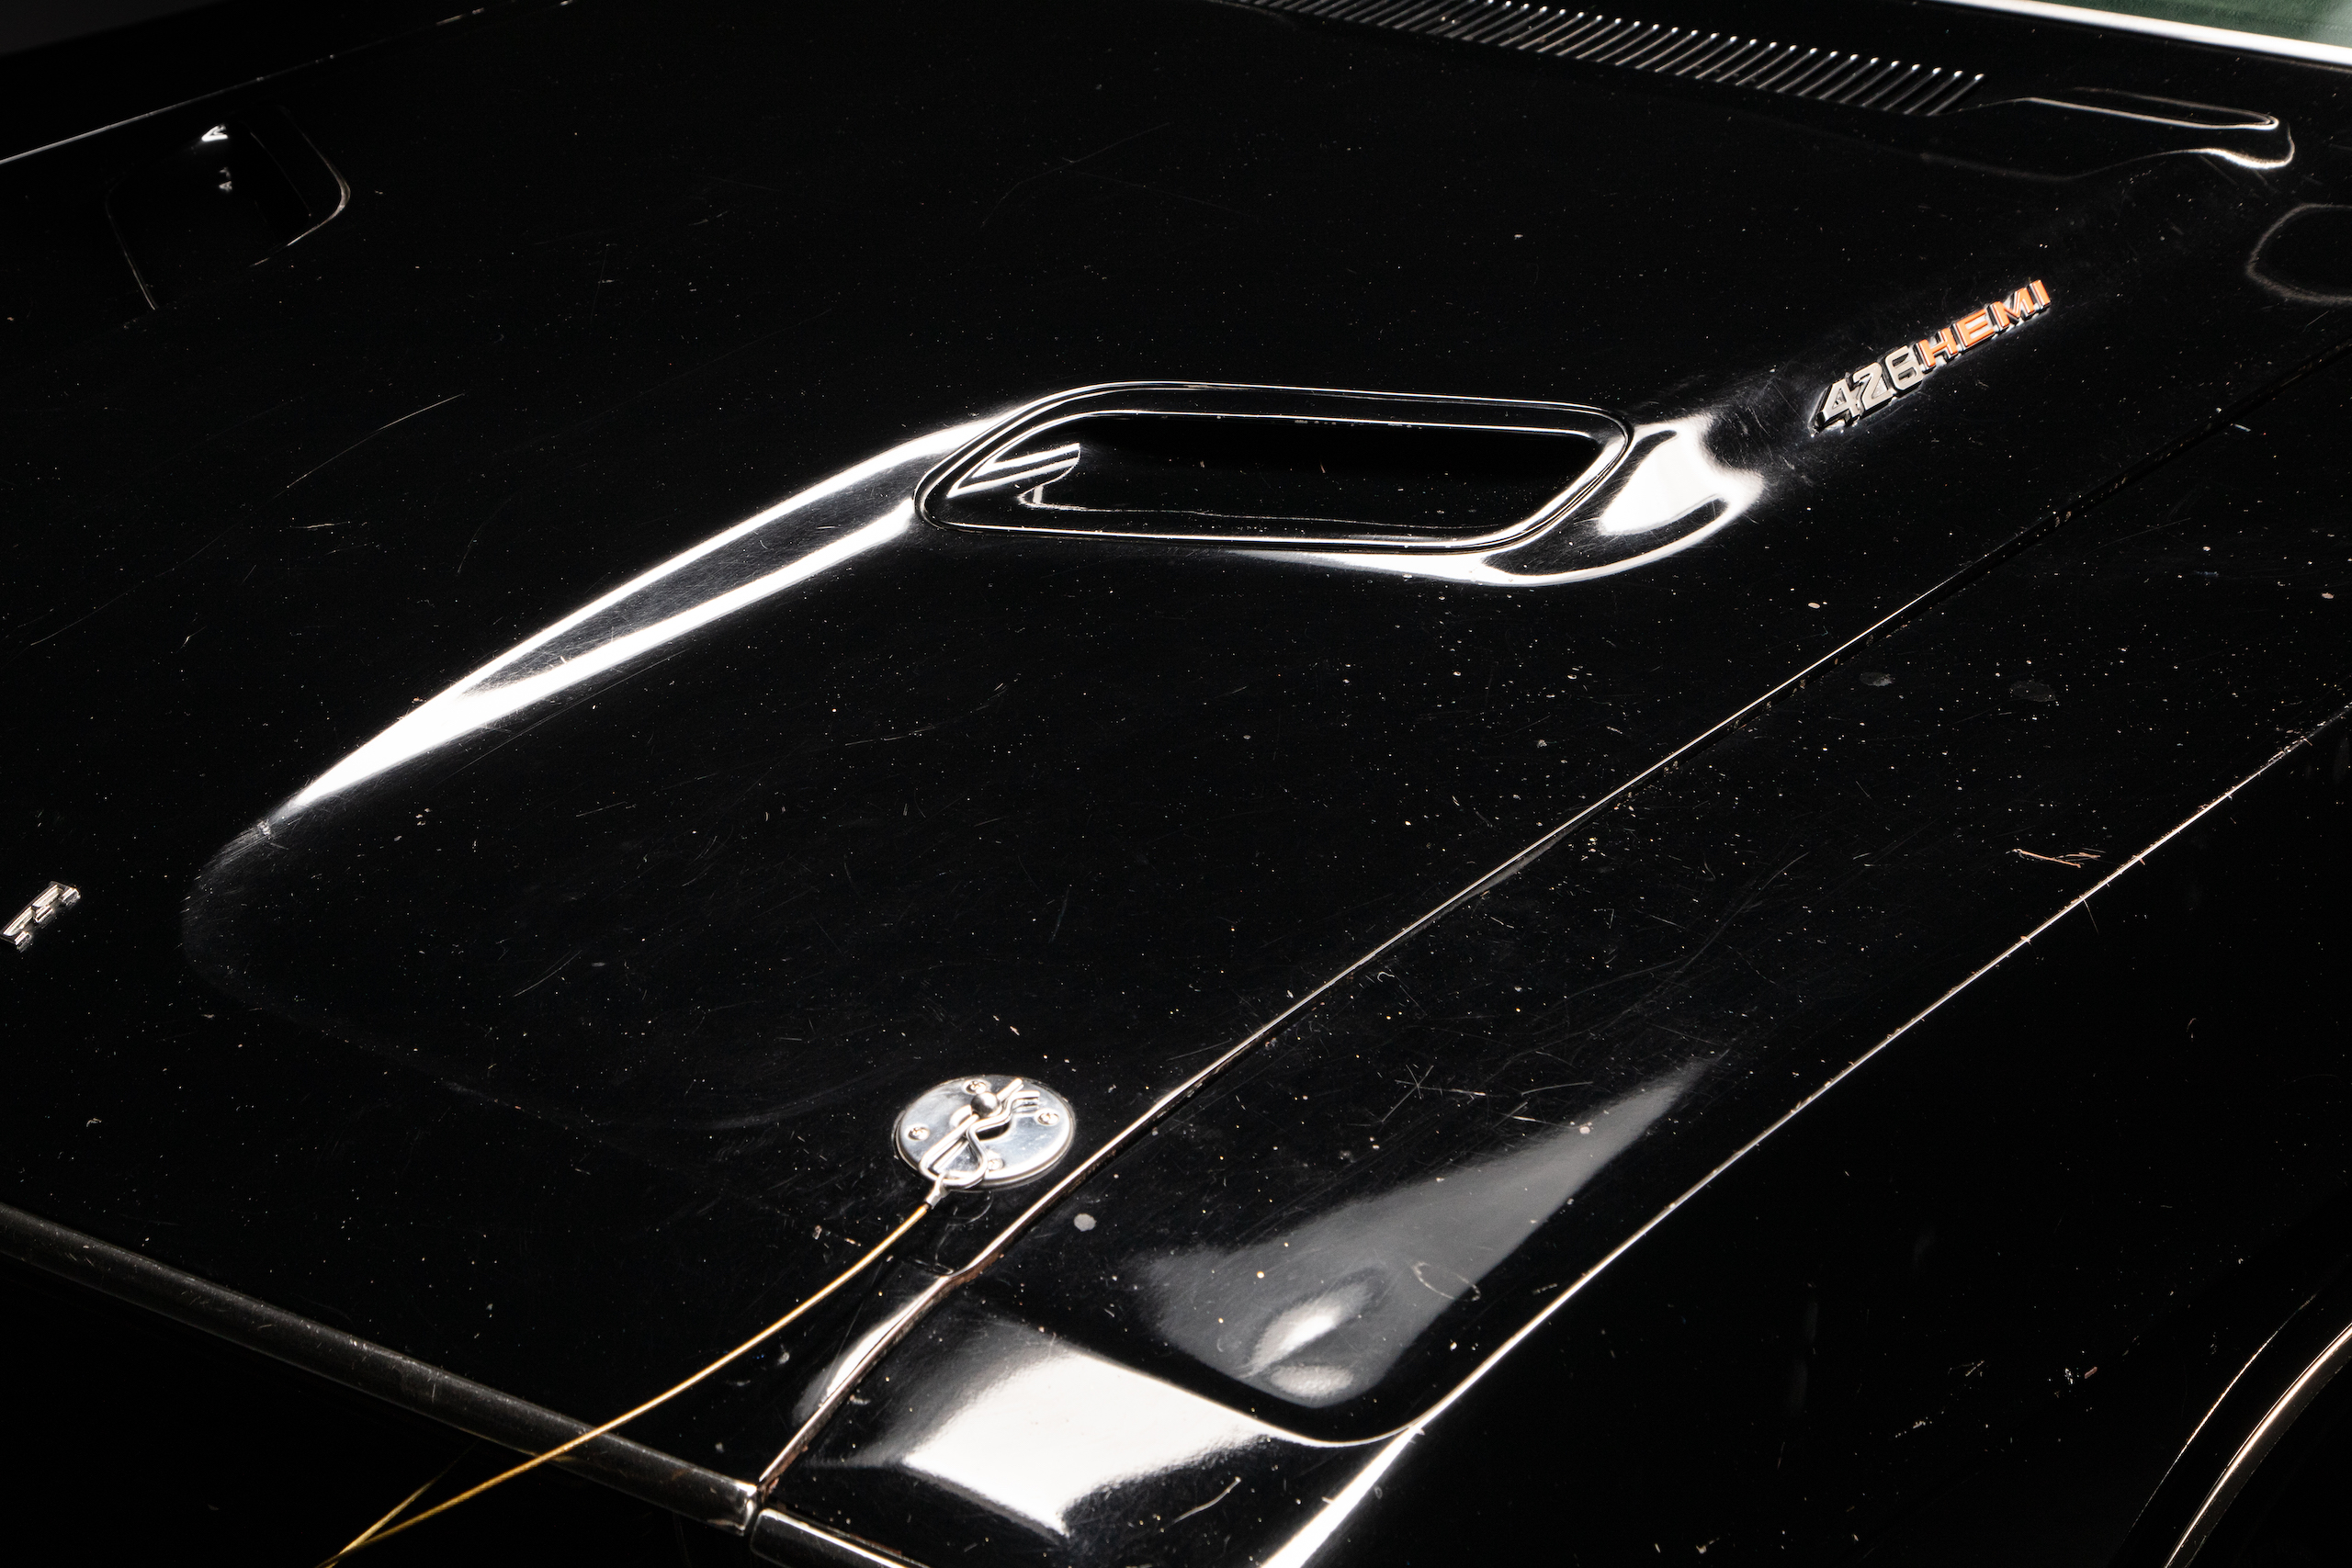 black ghost challenger hood vent detail